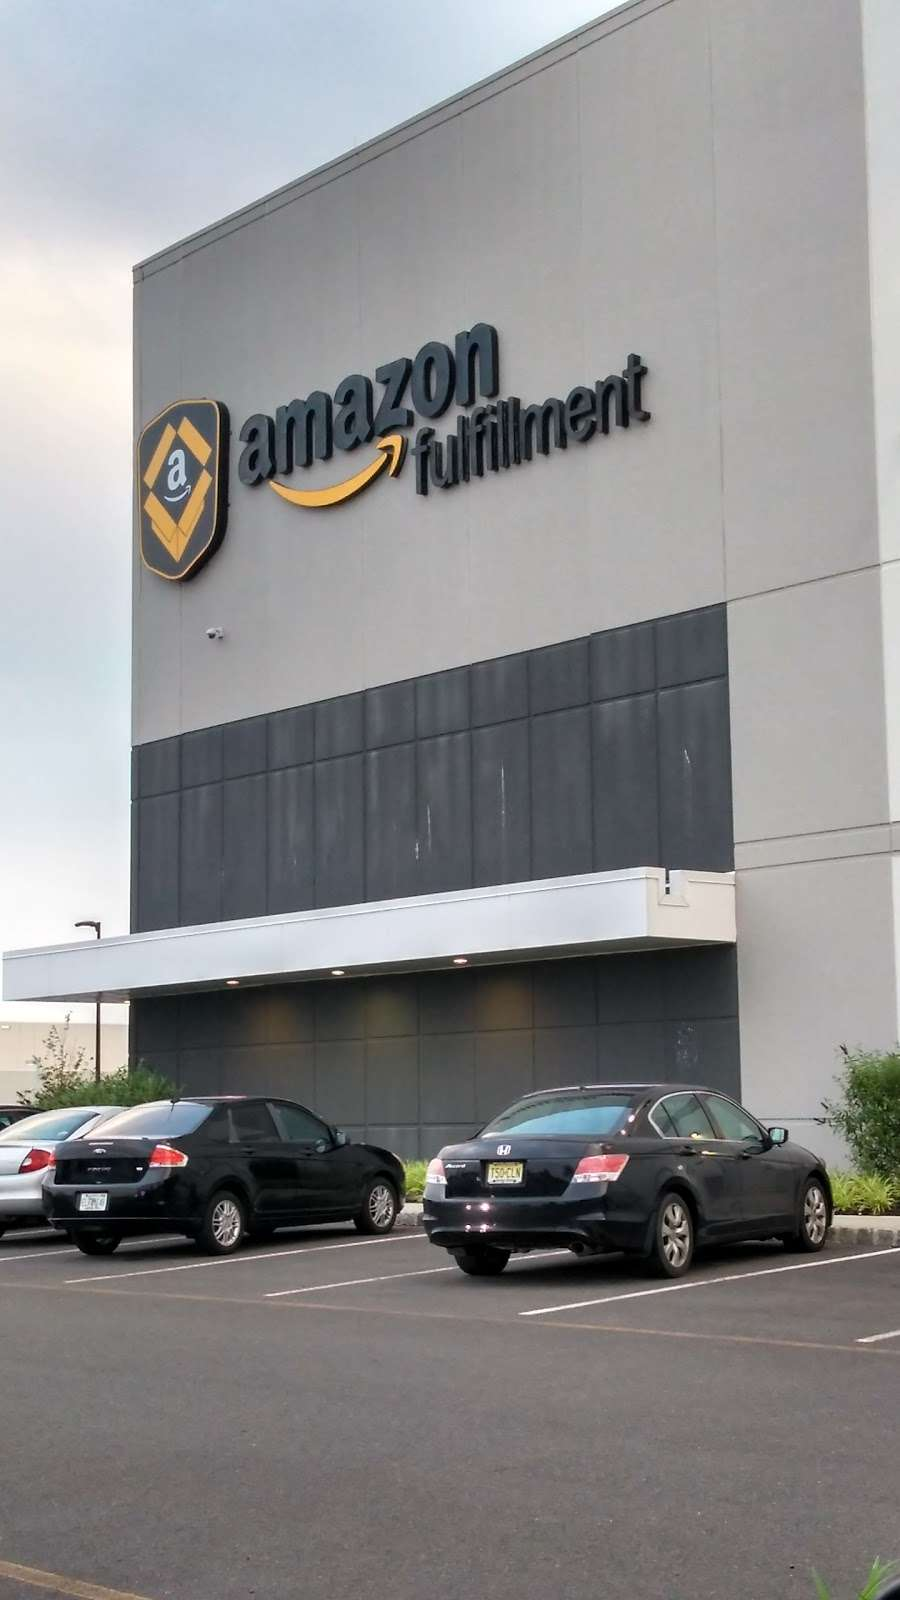 Amazon EWR4 - storage  | Photo 8 of 10 | Address: 50 New Canton Way, Robbinsville, NJ 08691, USA | Phone: (732) 979-7825